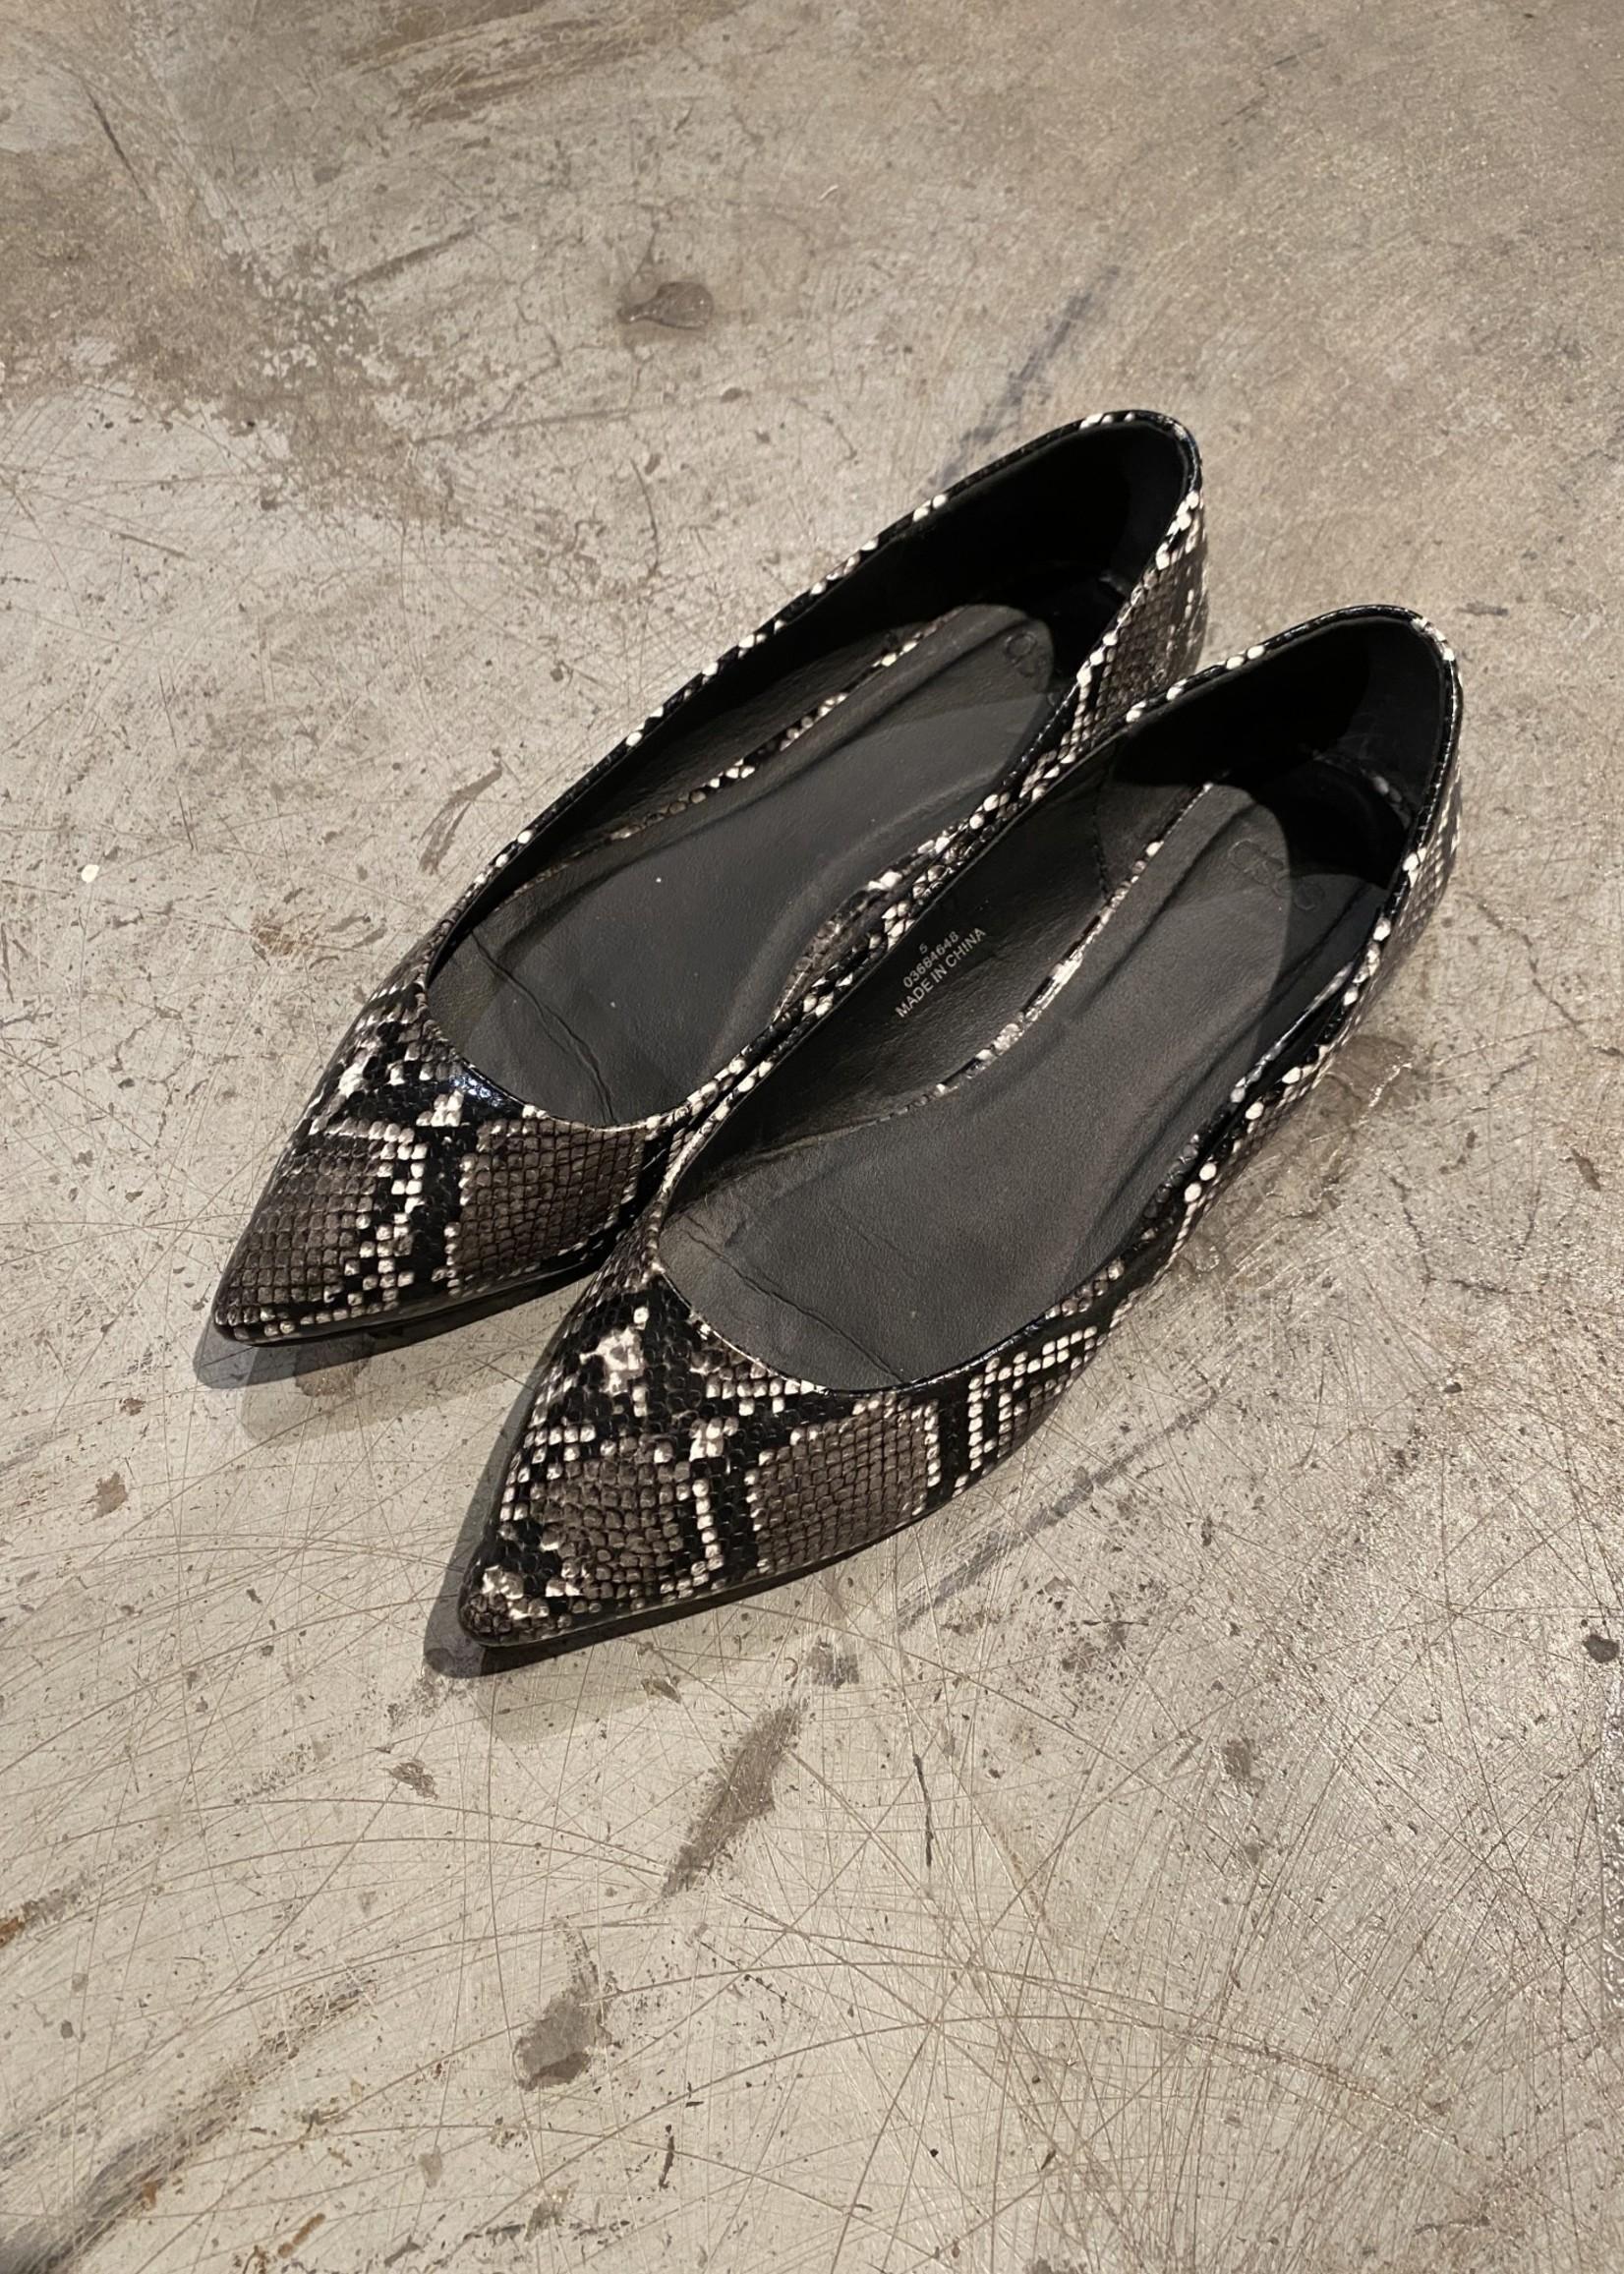 ASOS Black/Grey Reptile Flats 38